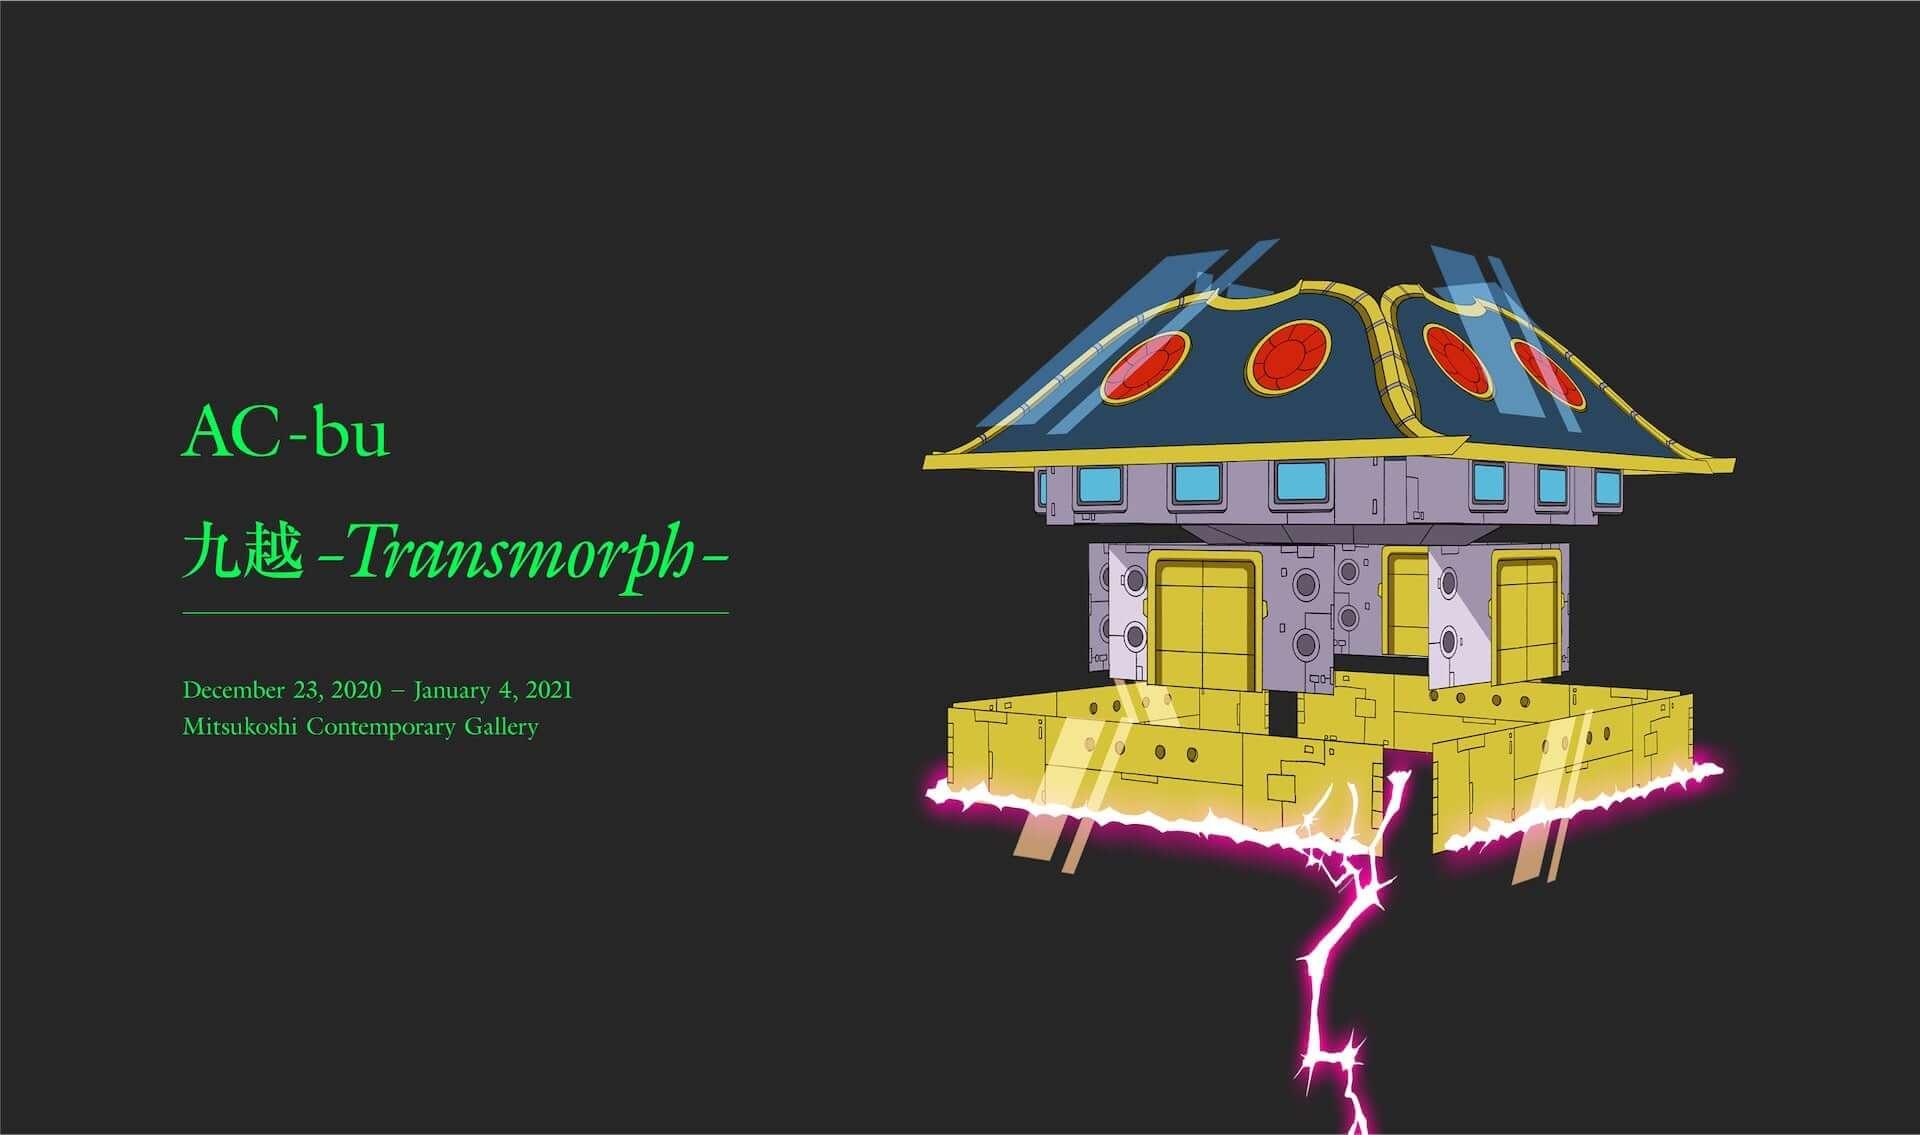 "AC部初の大規模個展<九越 -Transmorph->が日本橋三越本店で開催決定!Battles""Sugar Foot""『大宇宙ロボット祭』の最新作など展開 art201218_ac-bu_6-1920x1135"